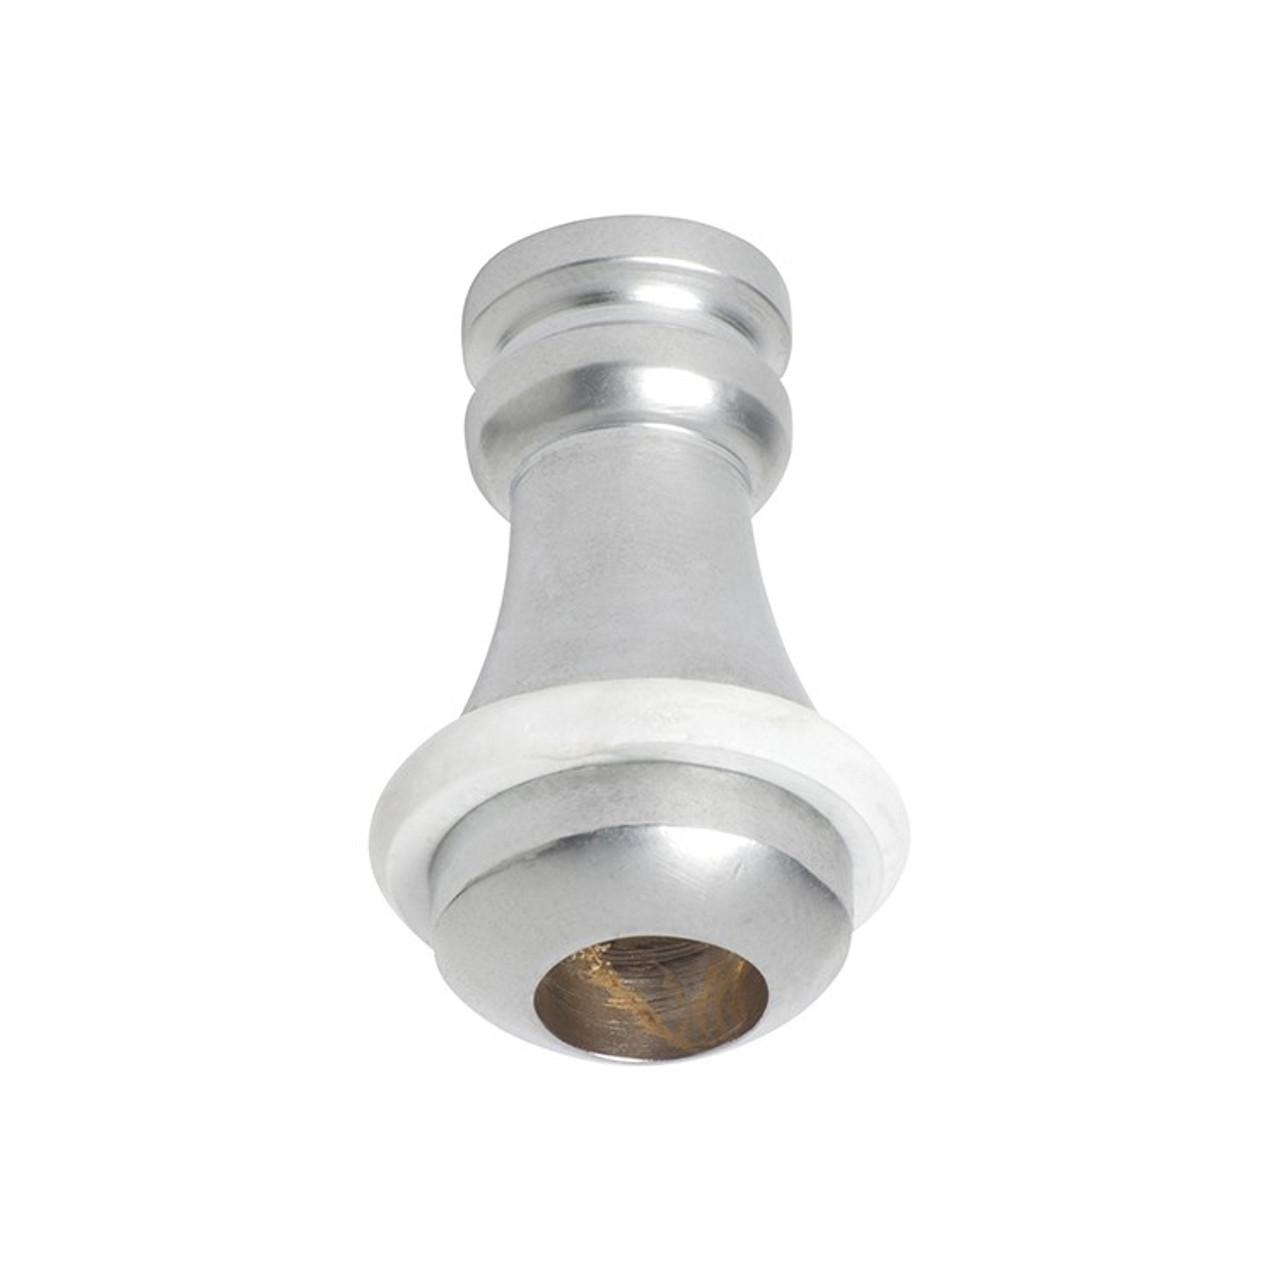 Satin Chrome Cord Weight - 4657